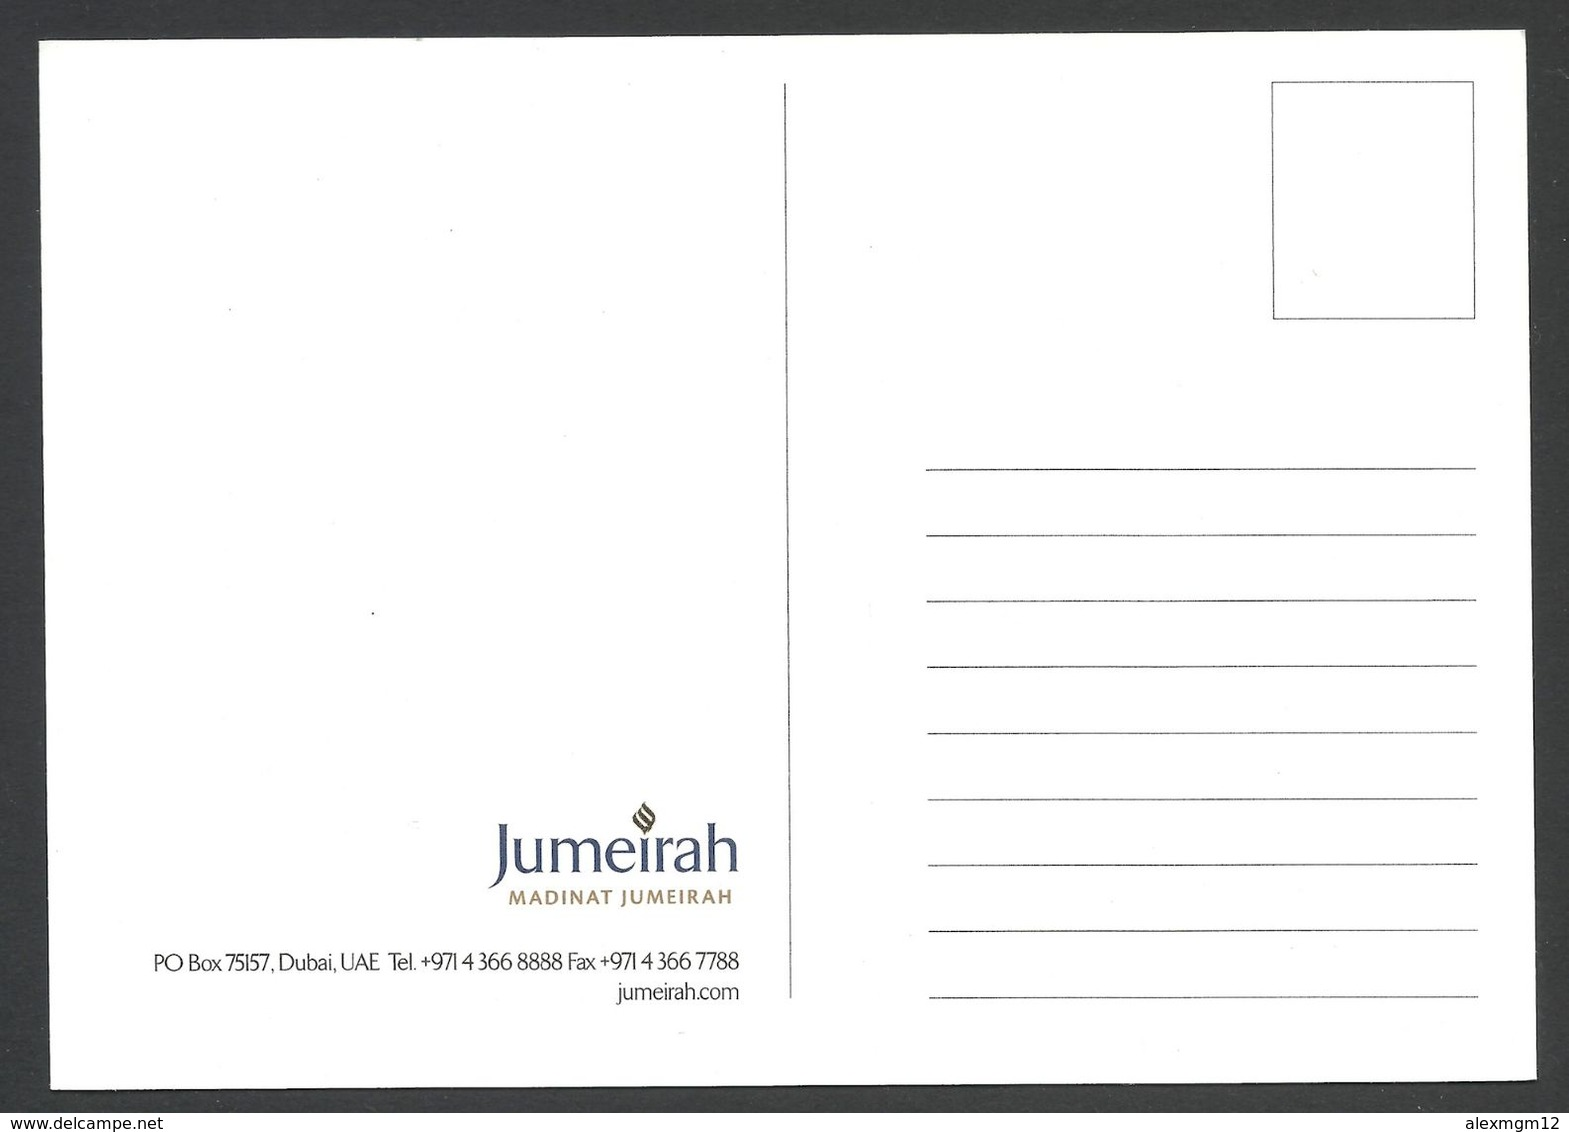 Madinat Jumeirah, UAE. - United Arab Emirates